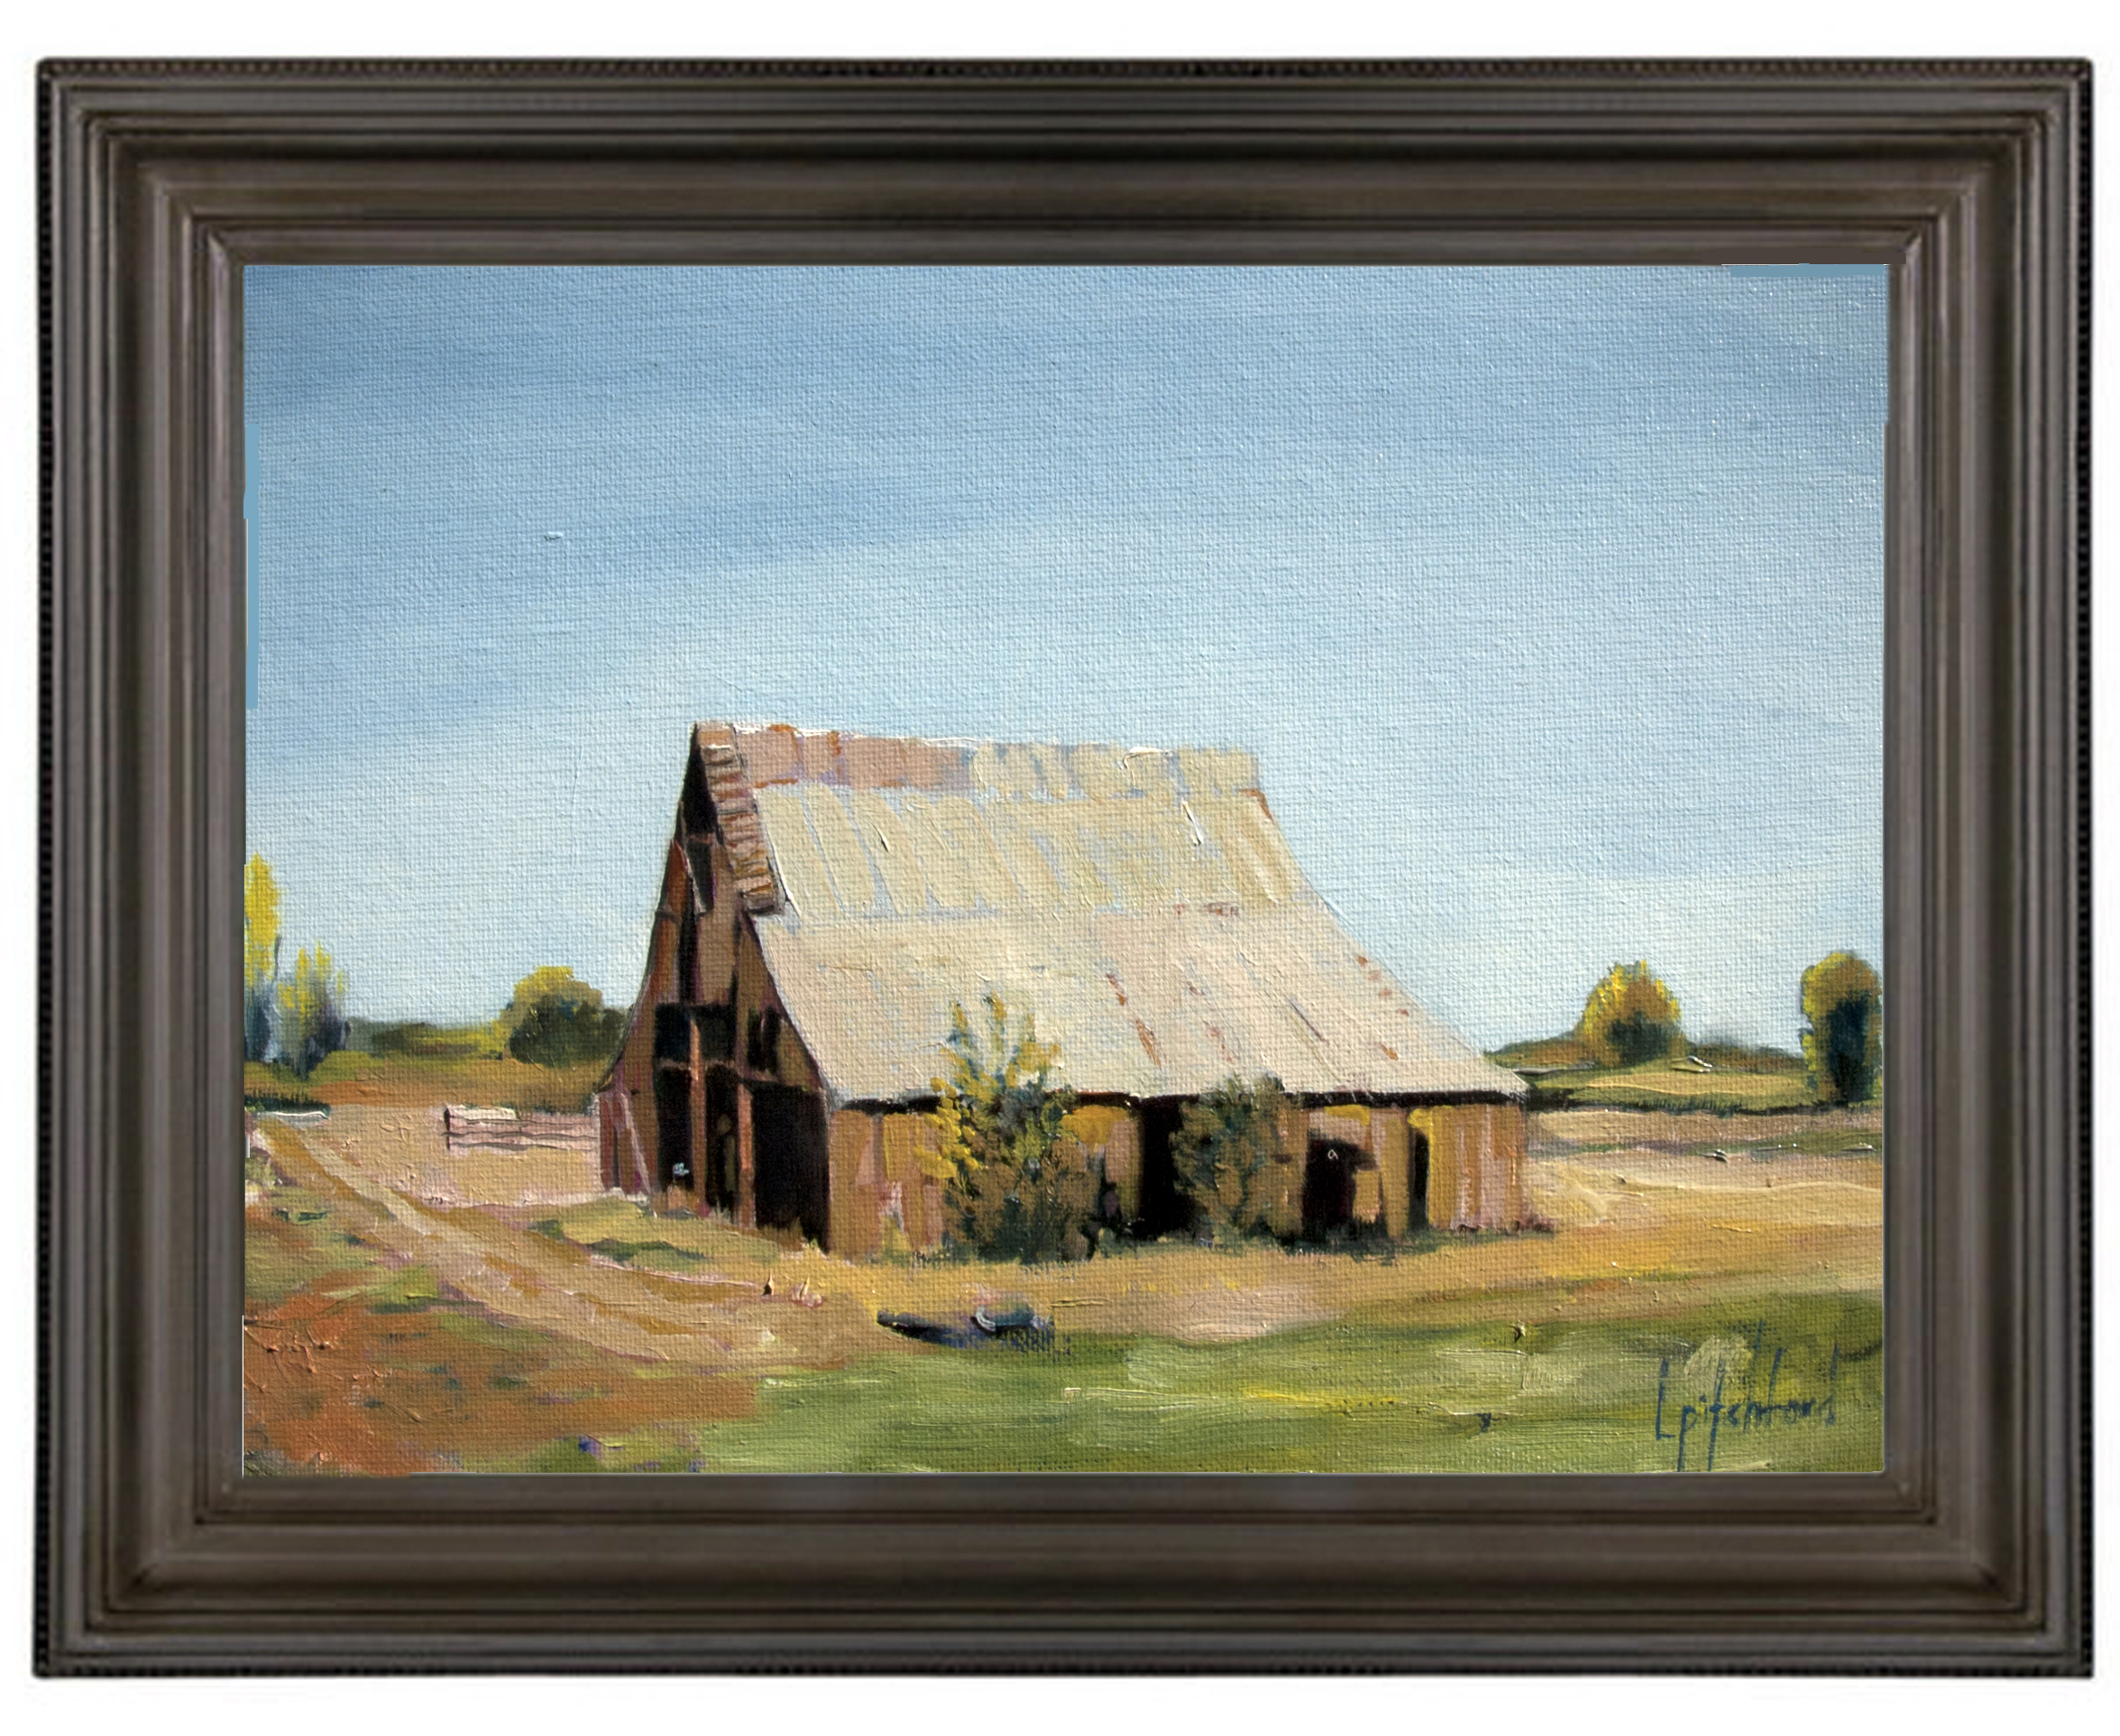 "Mid-July Barn - Springville, Utah 9x12"" purhcase here:  https://www.etsy.com/your/shops/utahn"